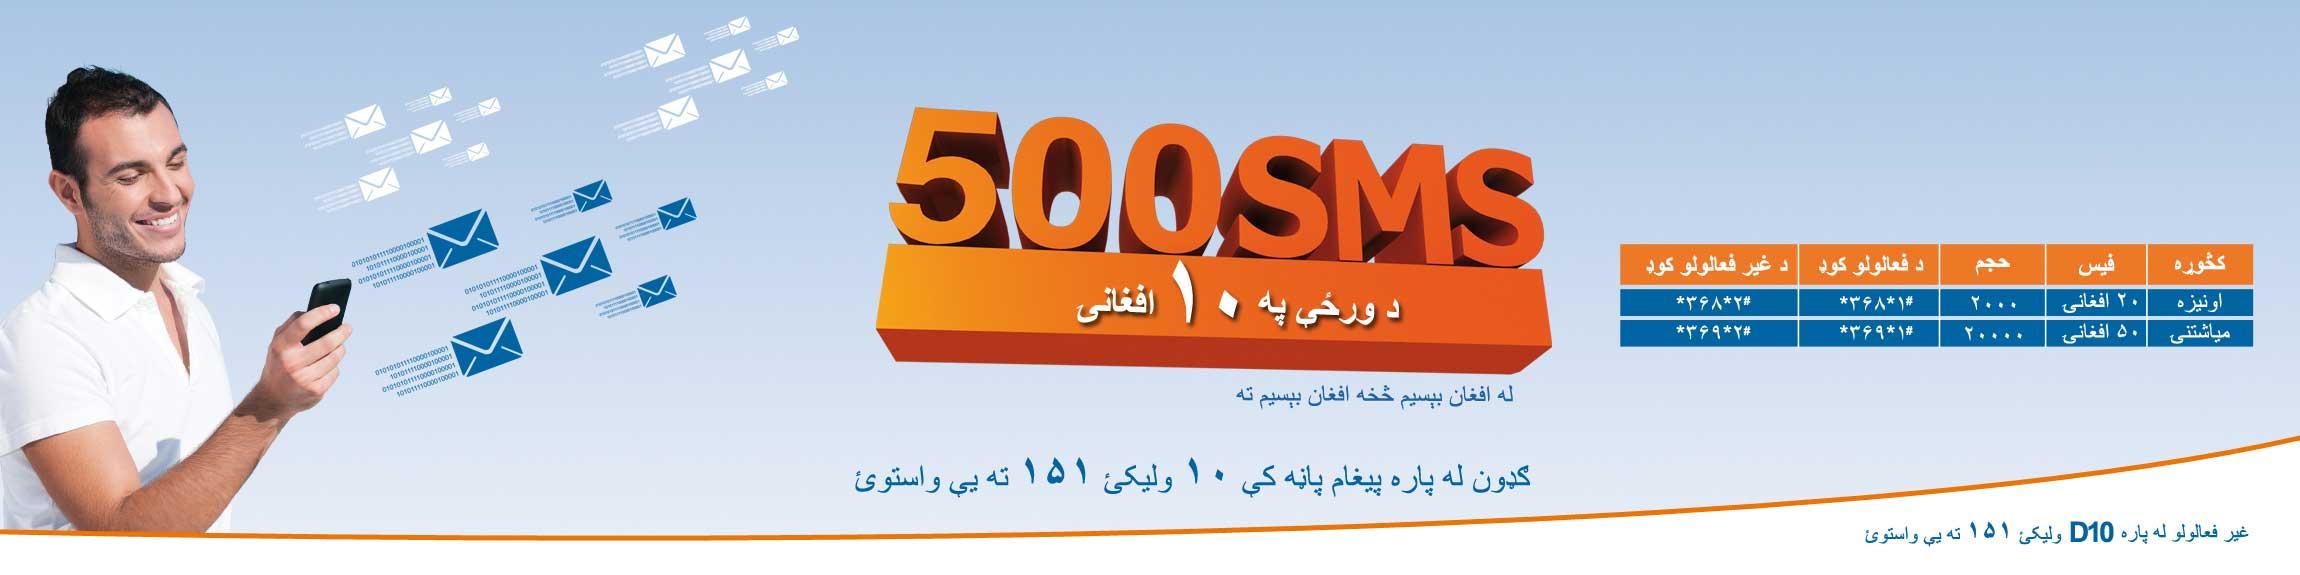 sms-bundle-for-website-pashto